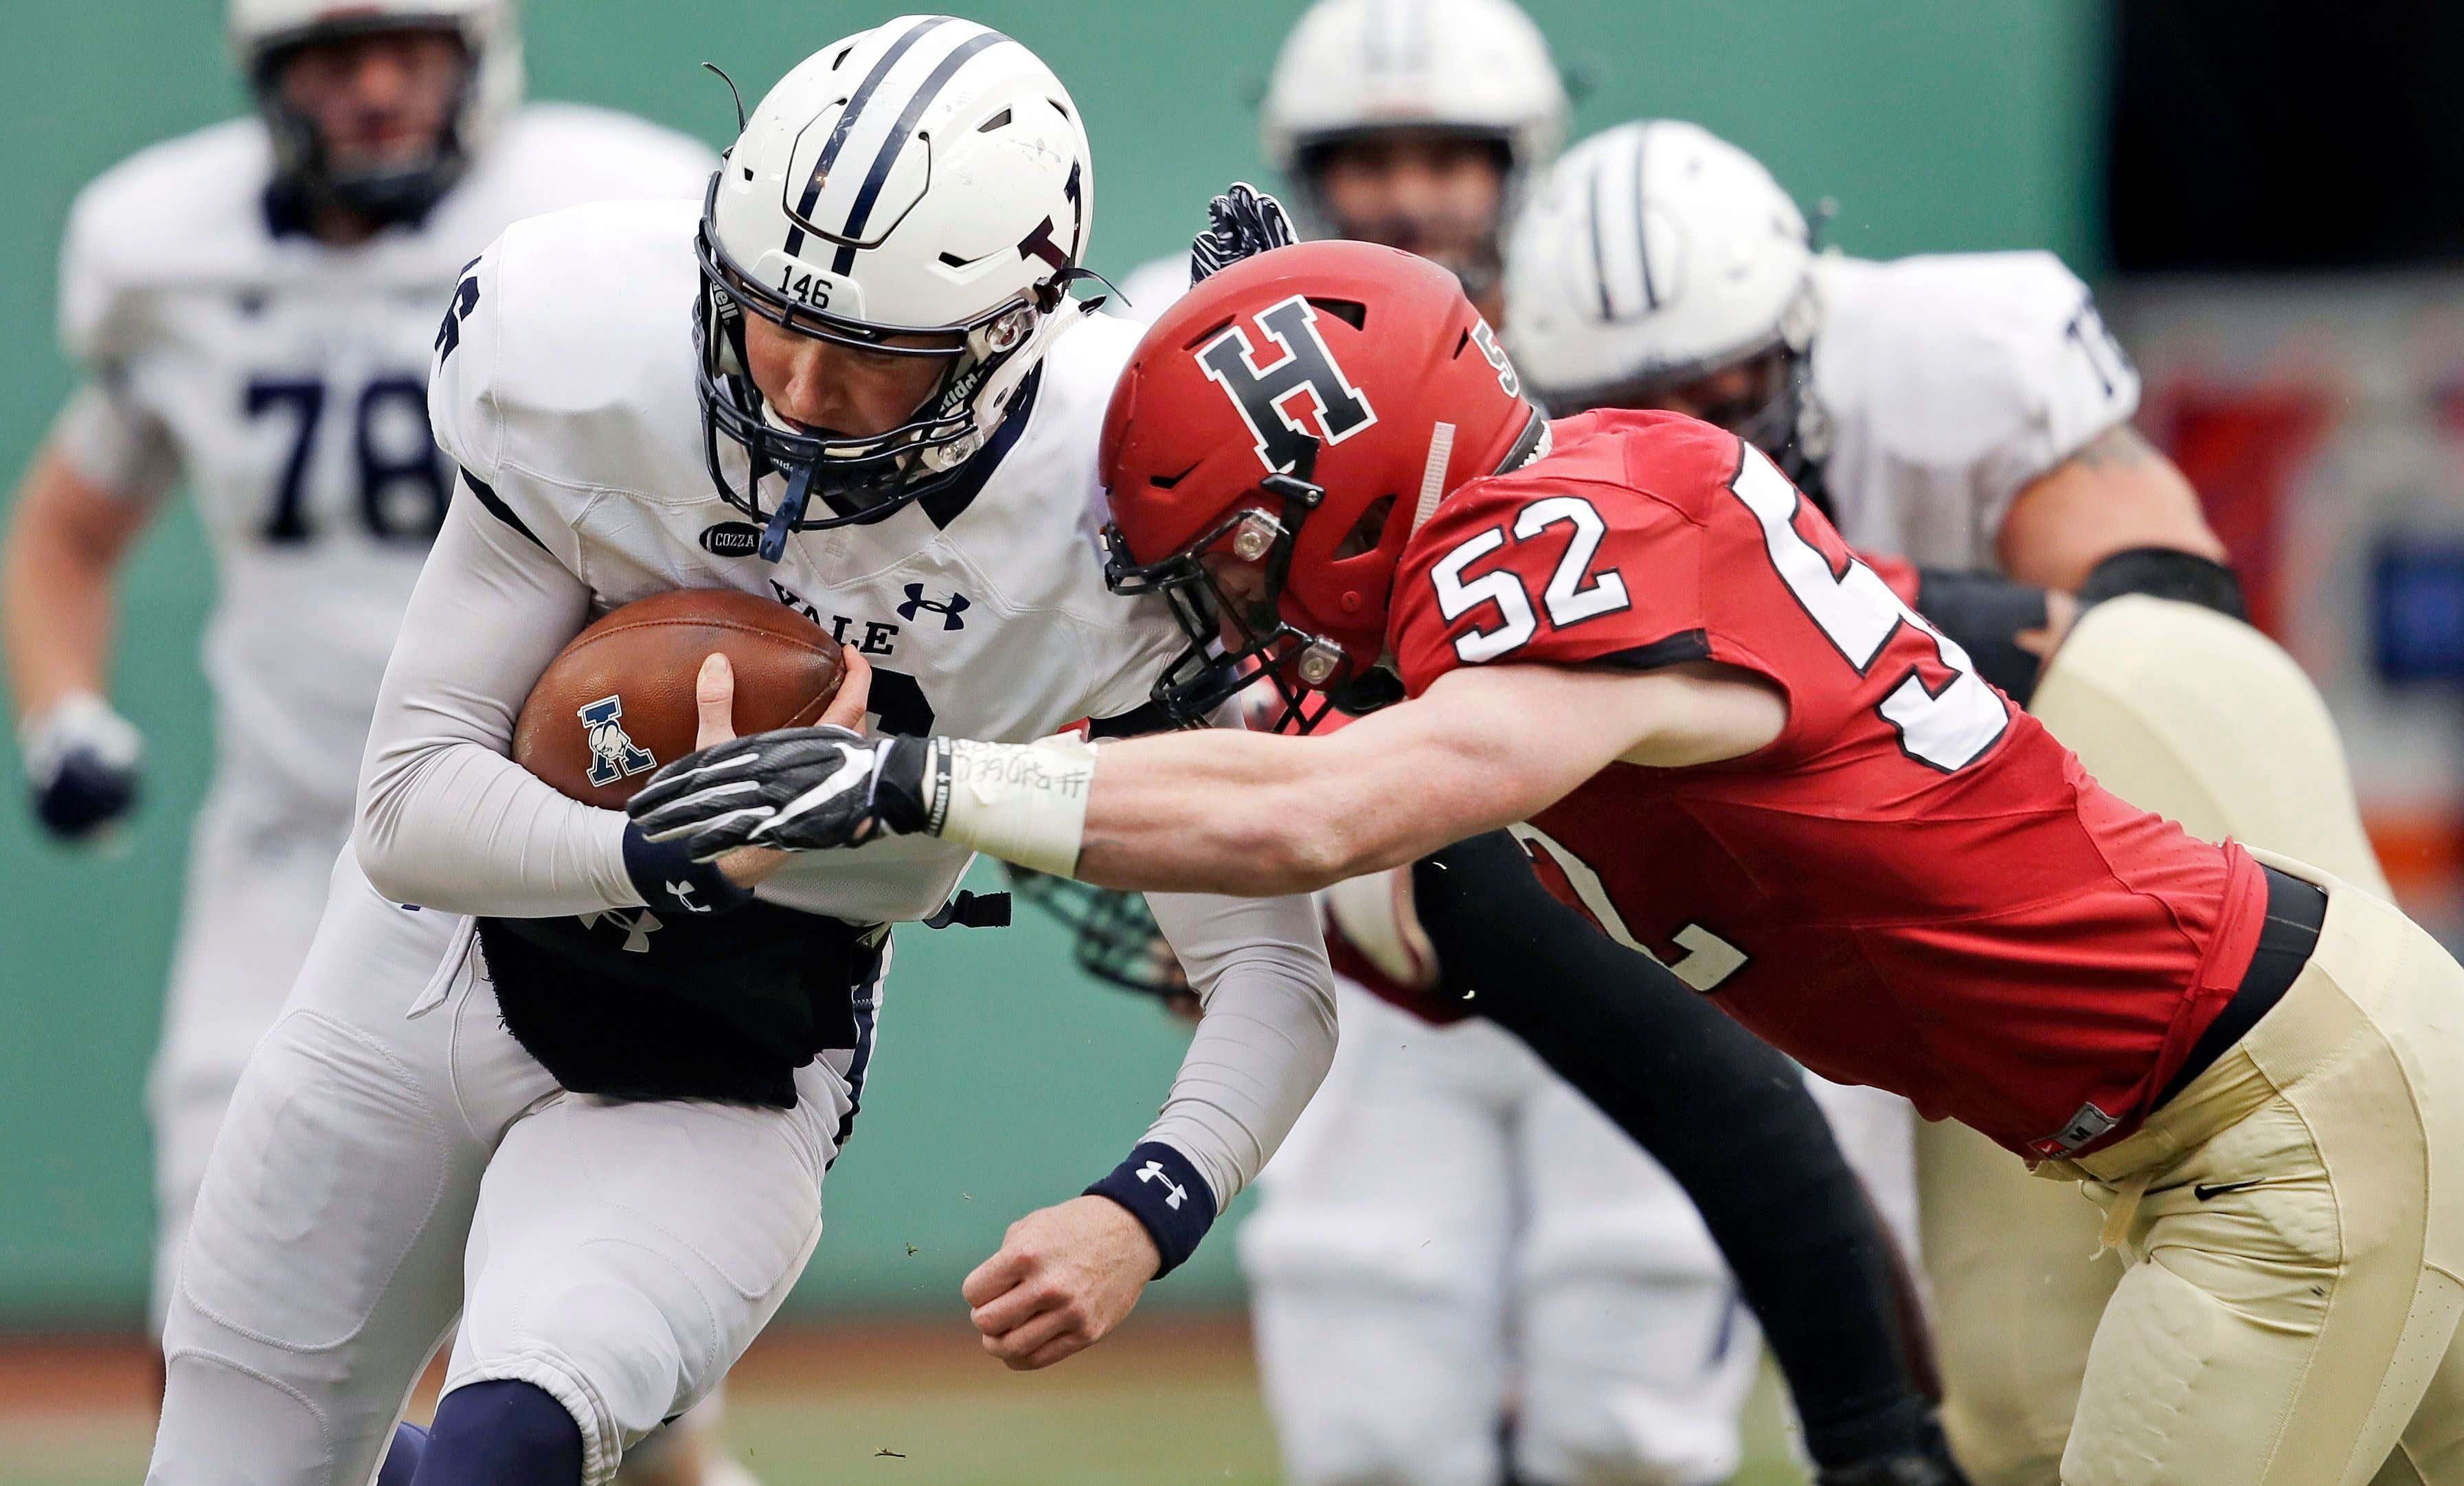 Yale Harvard Football, Boston, USA - 17 Nov 2018